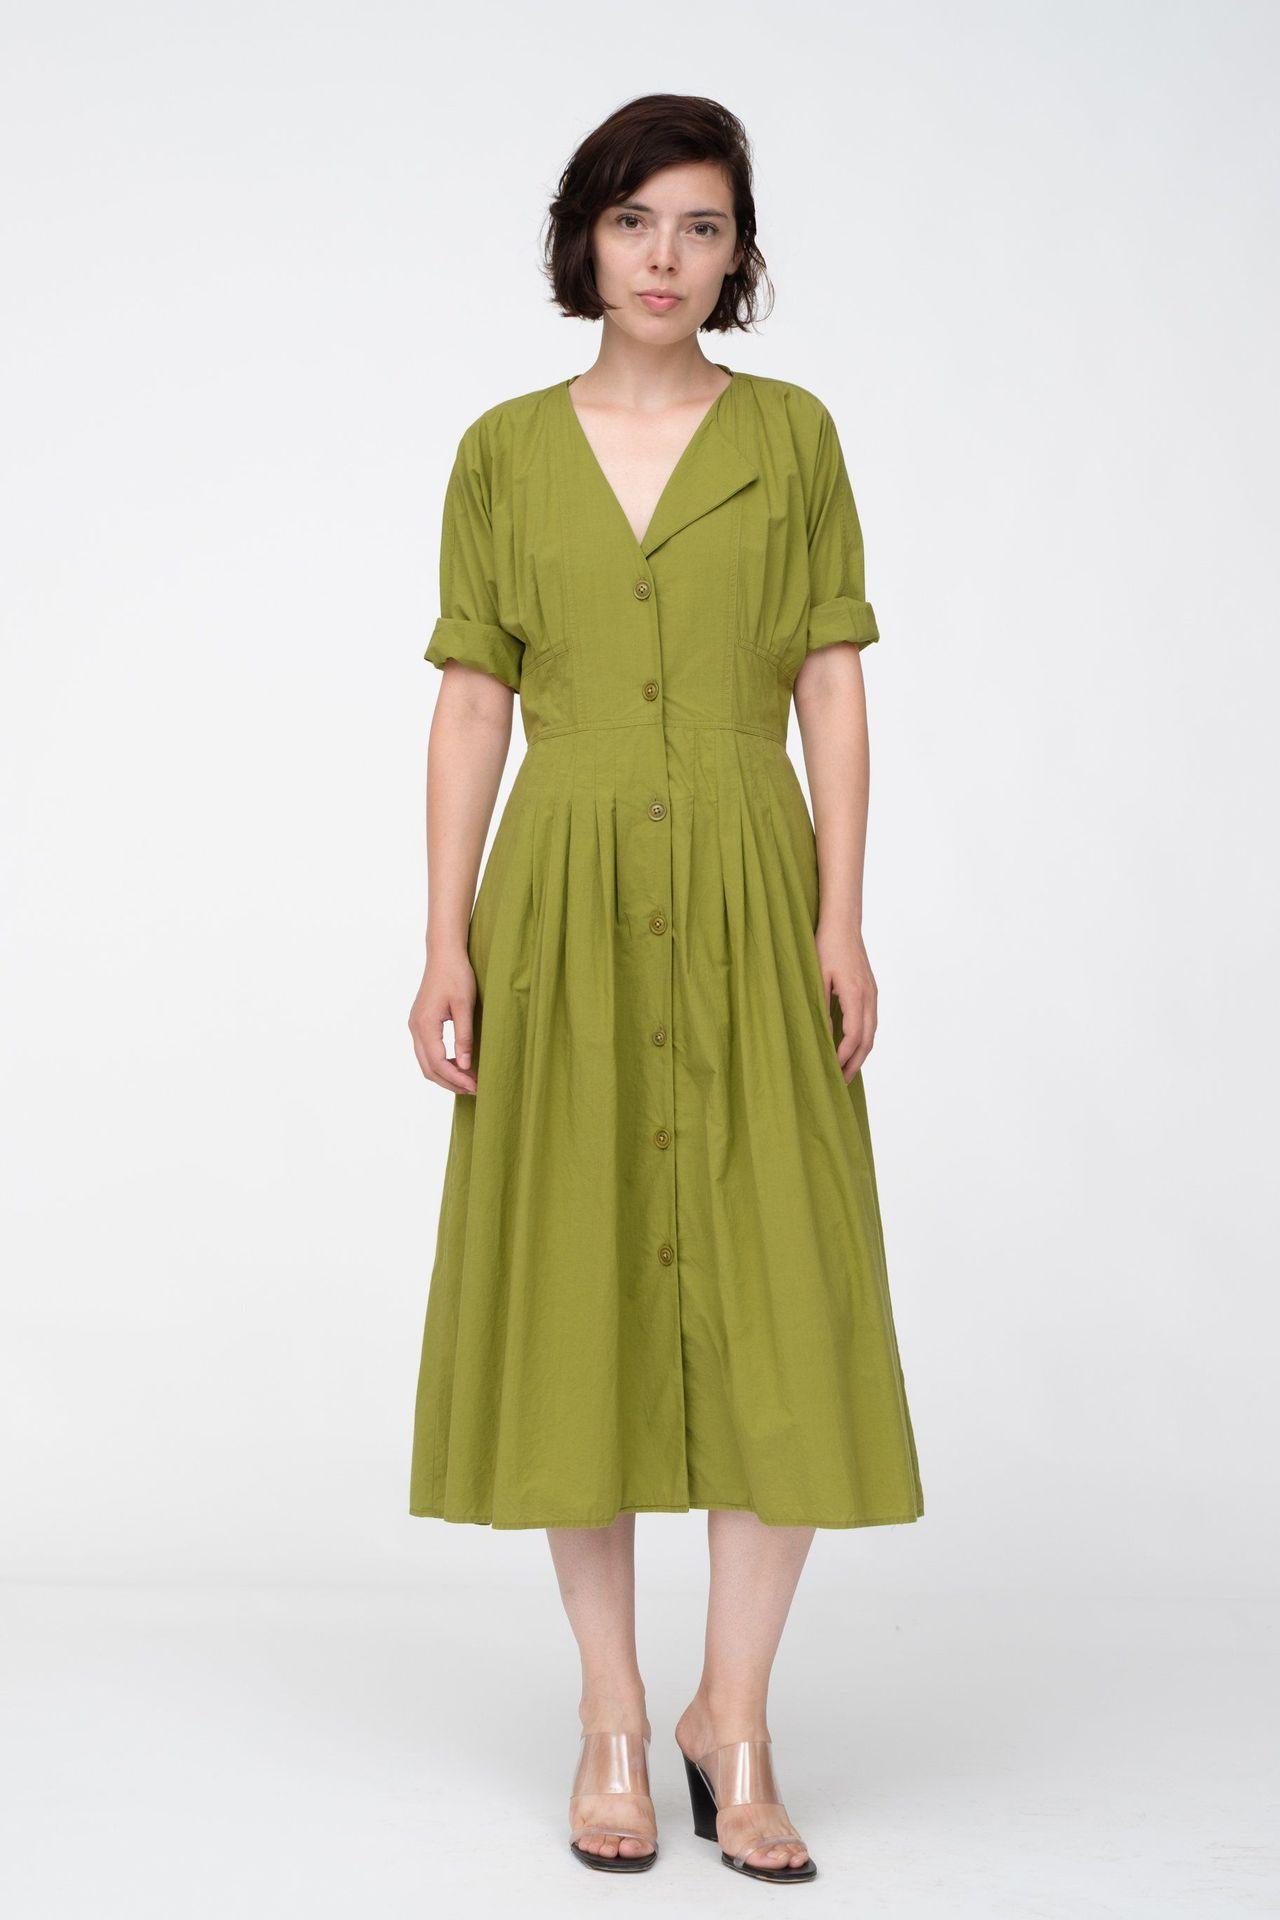 Women Dress 2019 New Retro Mustard Green Solid Color Dress ...